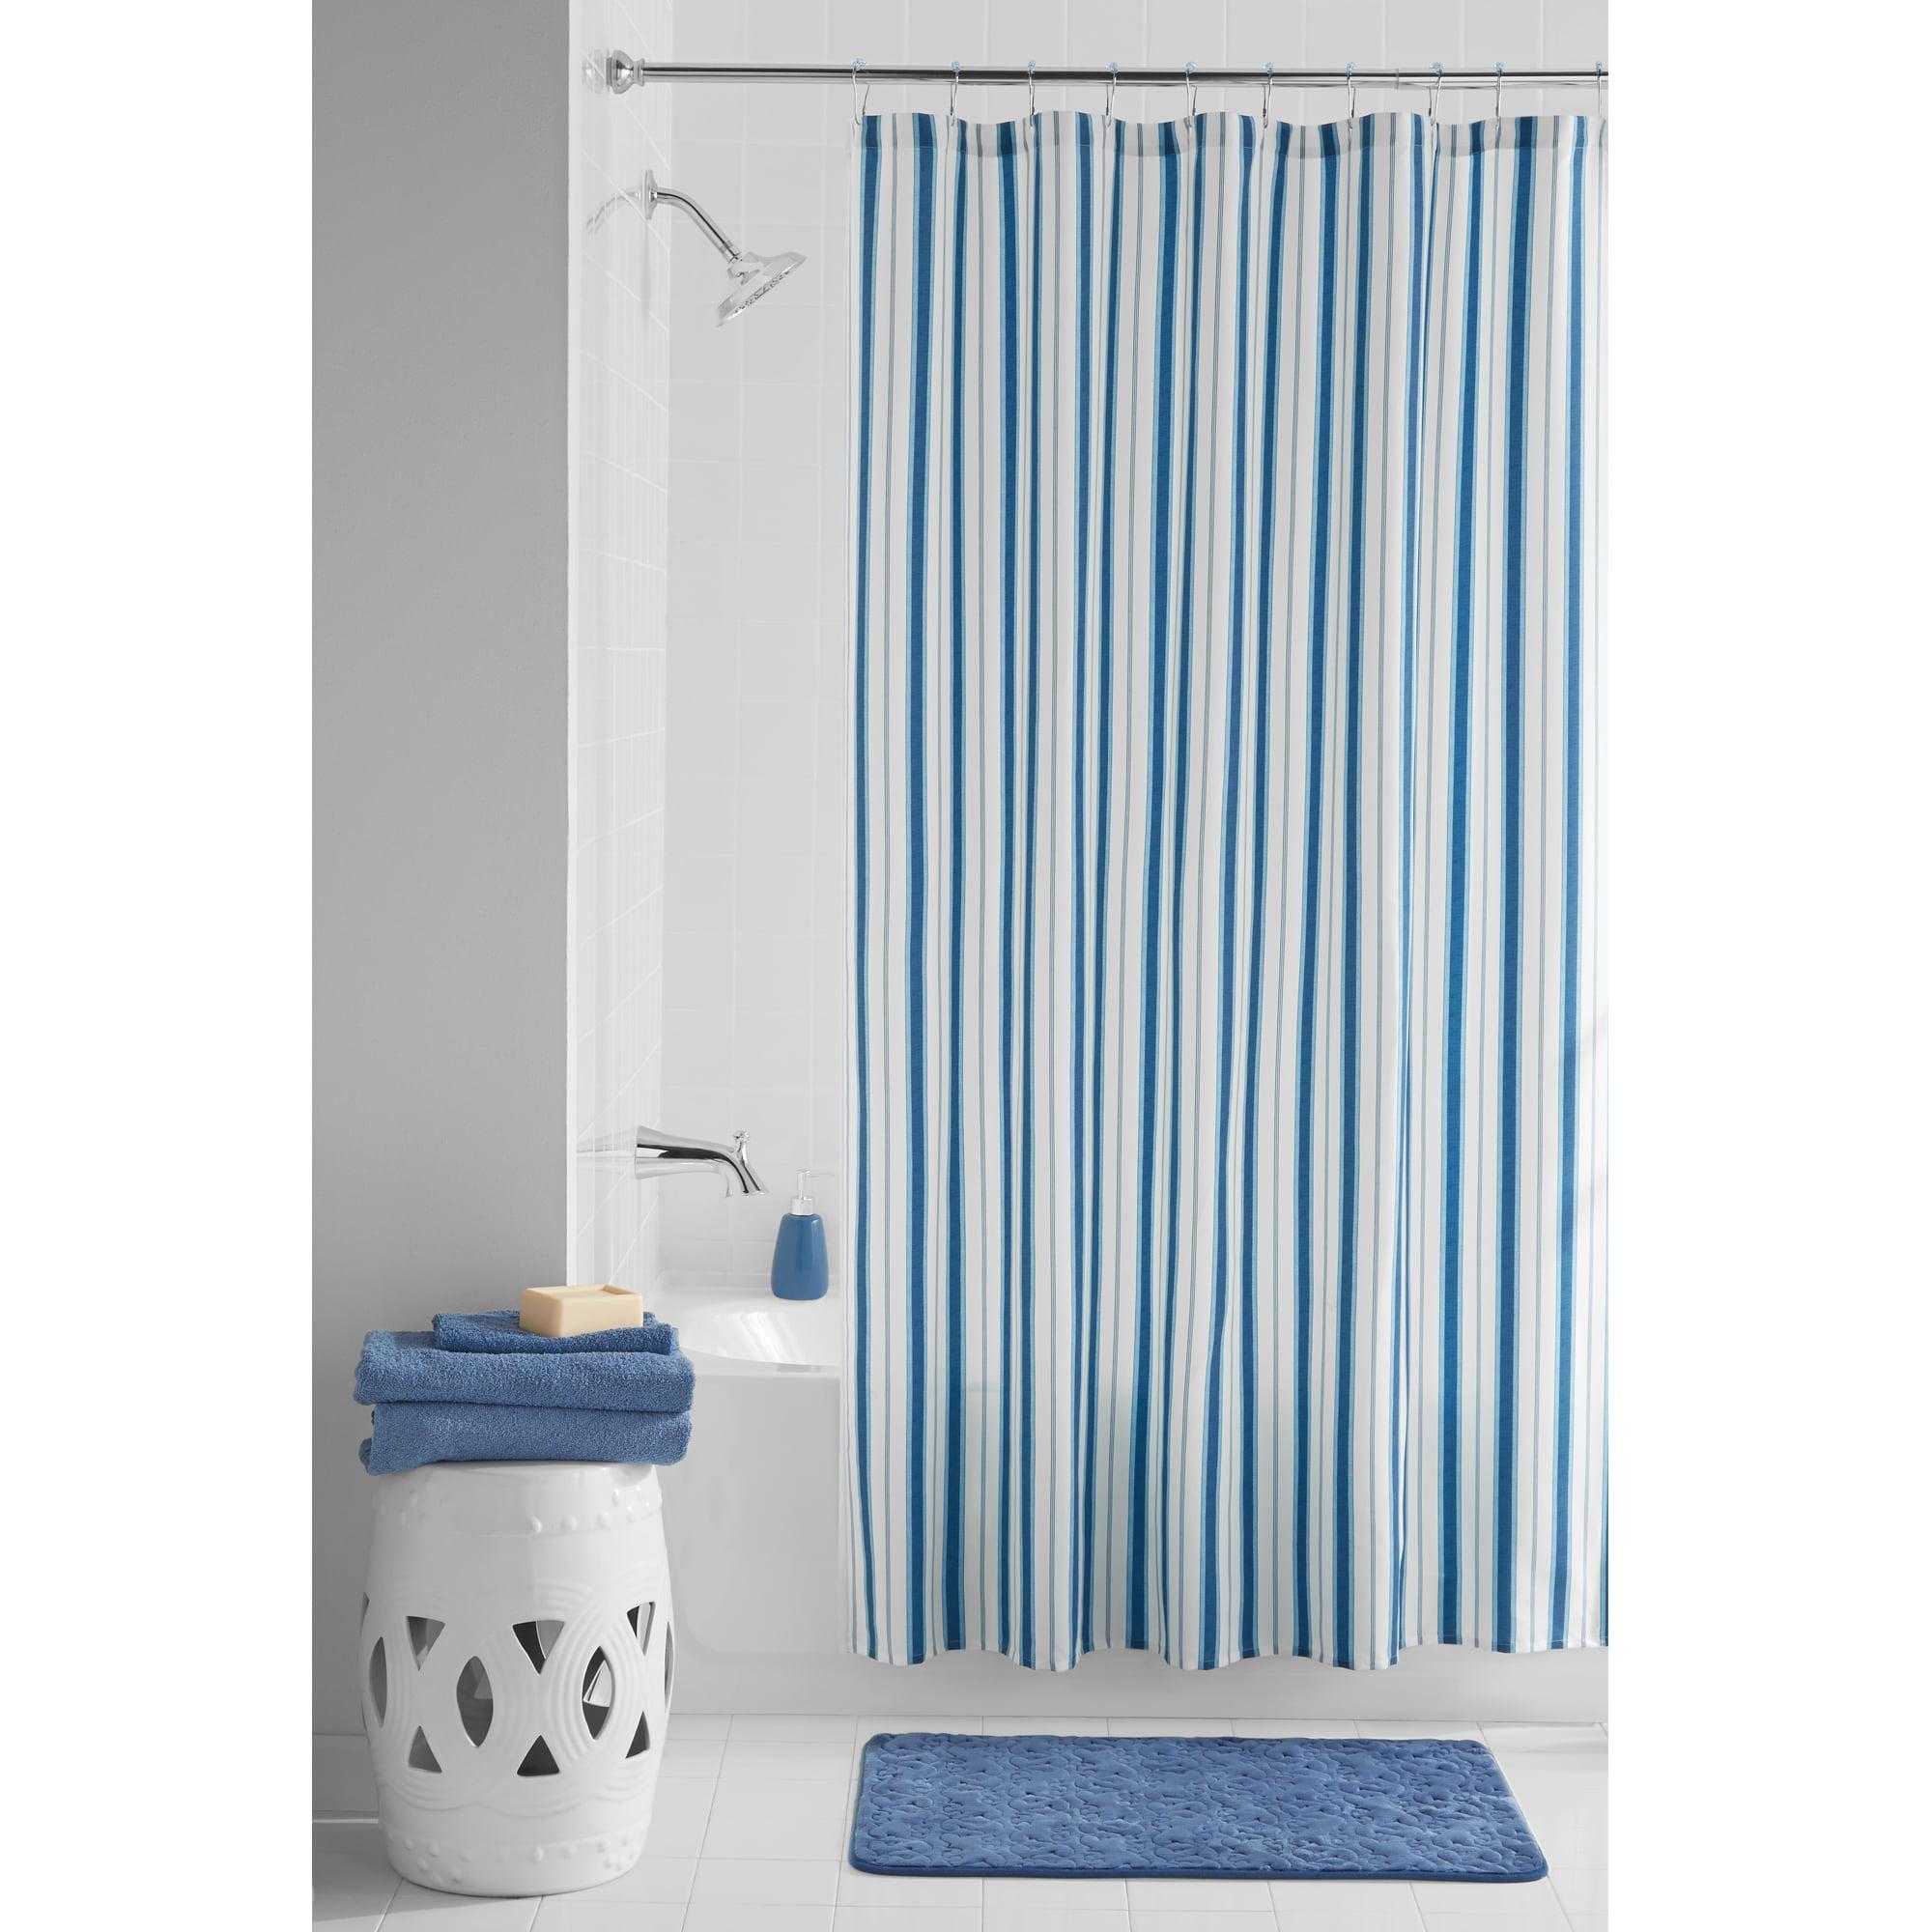 Mainstays Boardwalk Fabric 13-Piece Shower Curtain Set